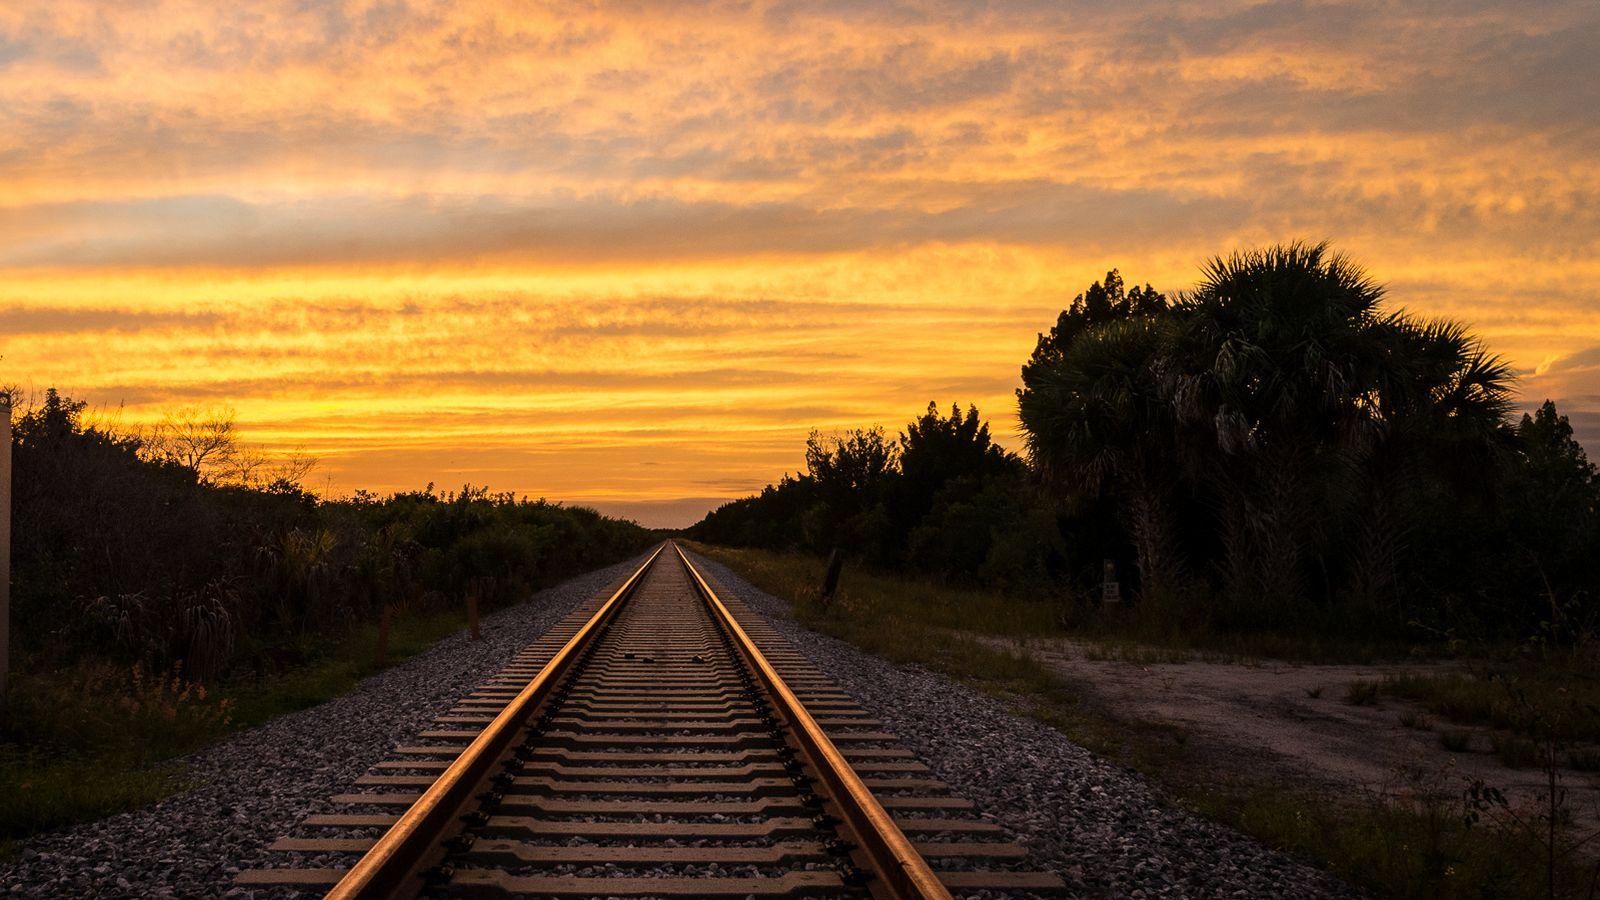 railroad background 20 - [1600x900]